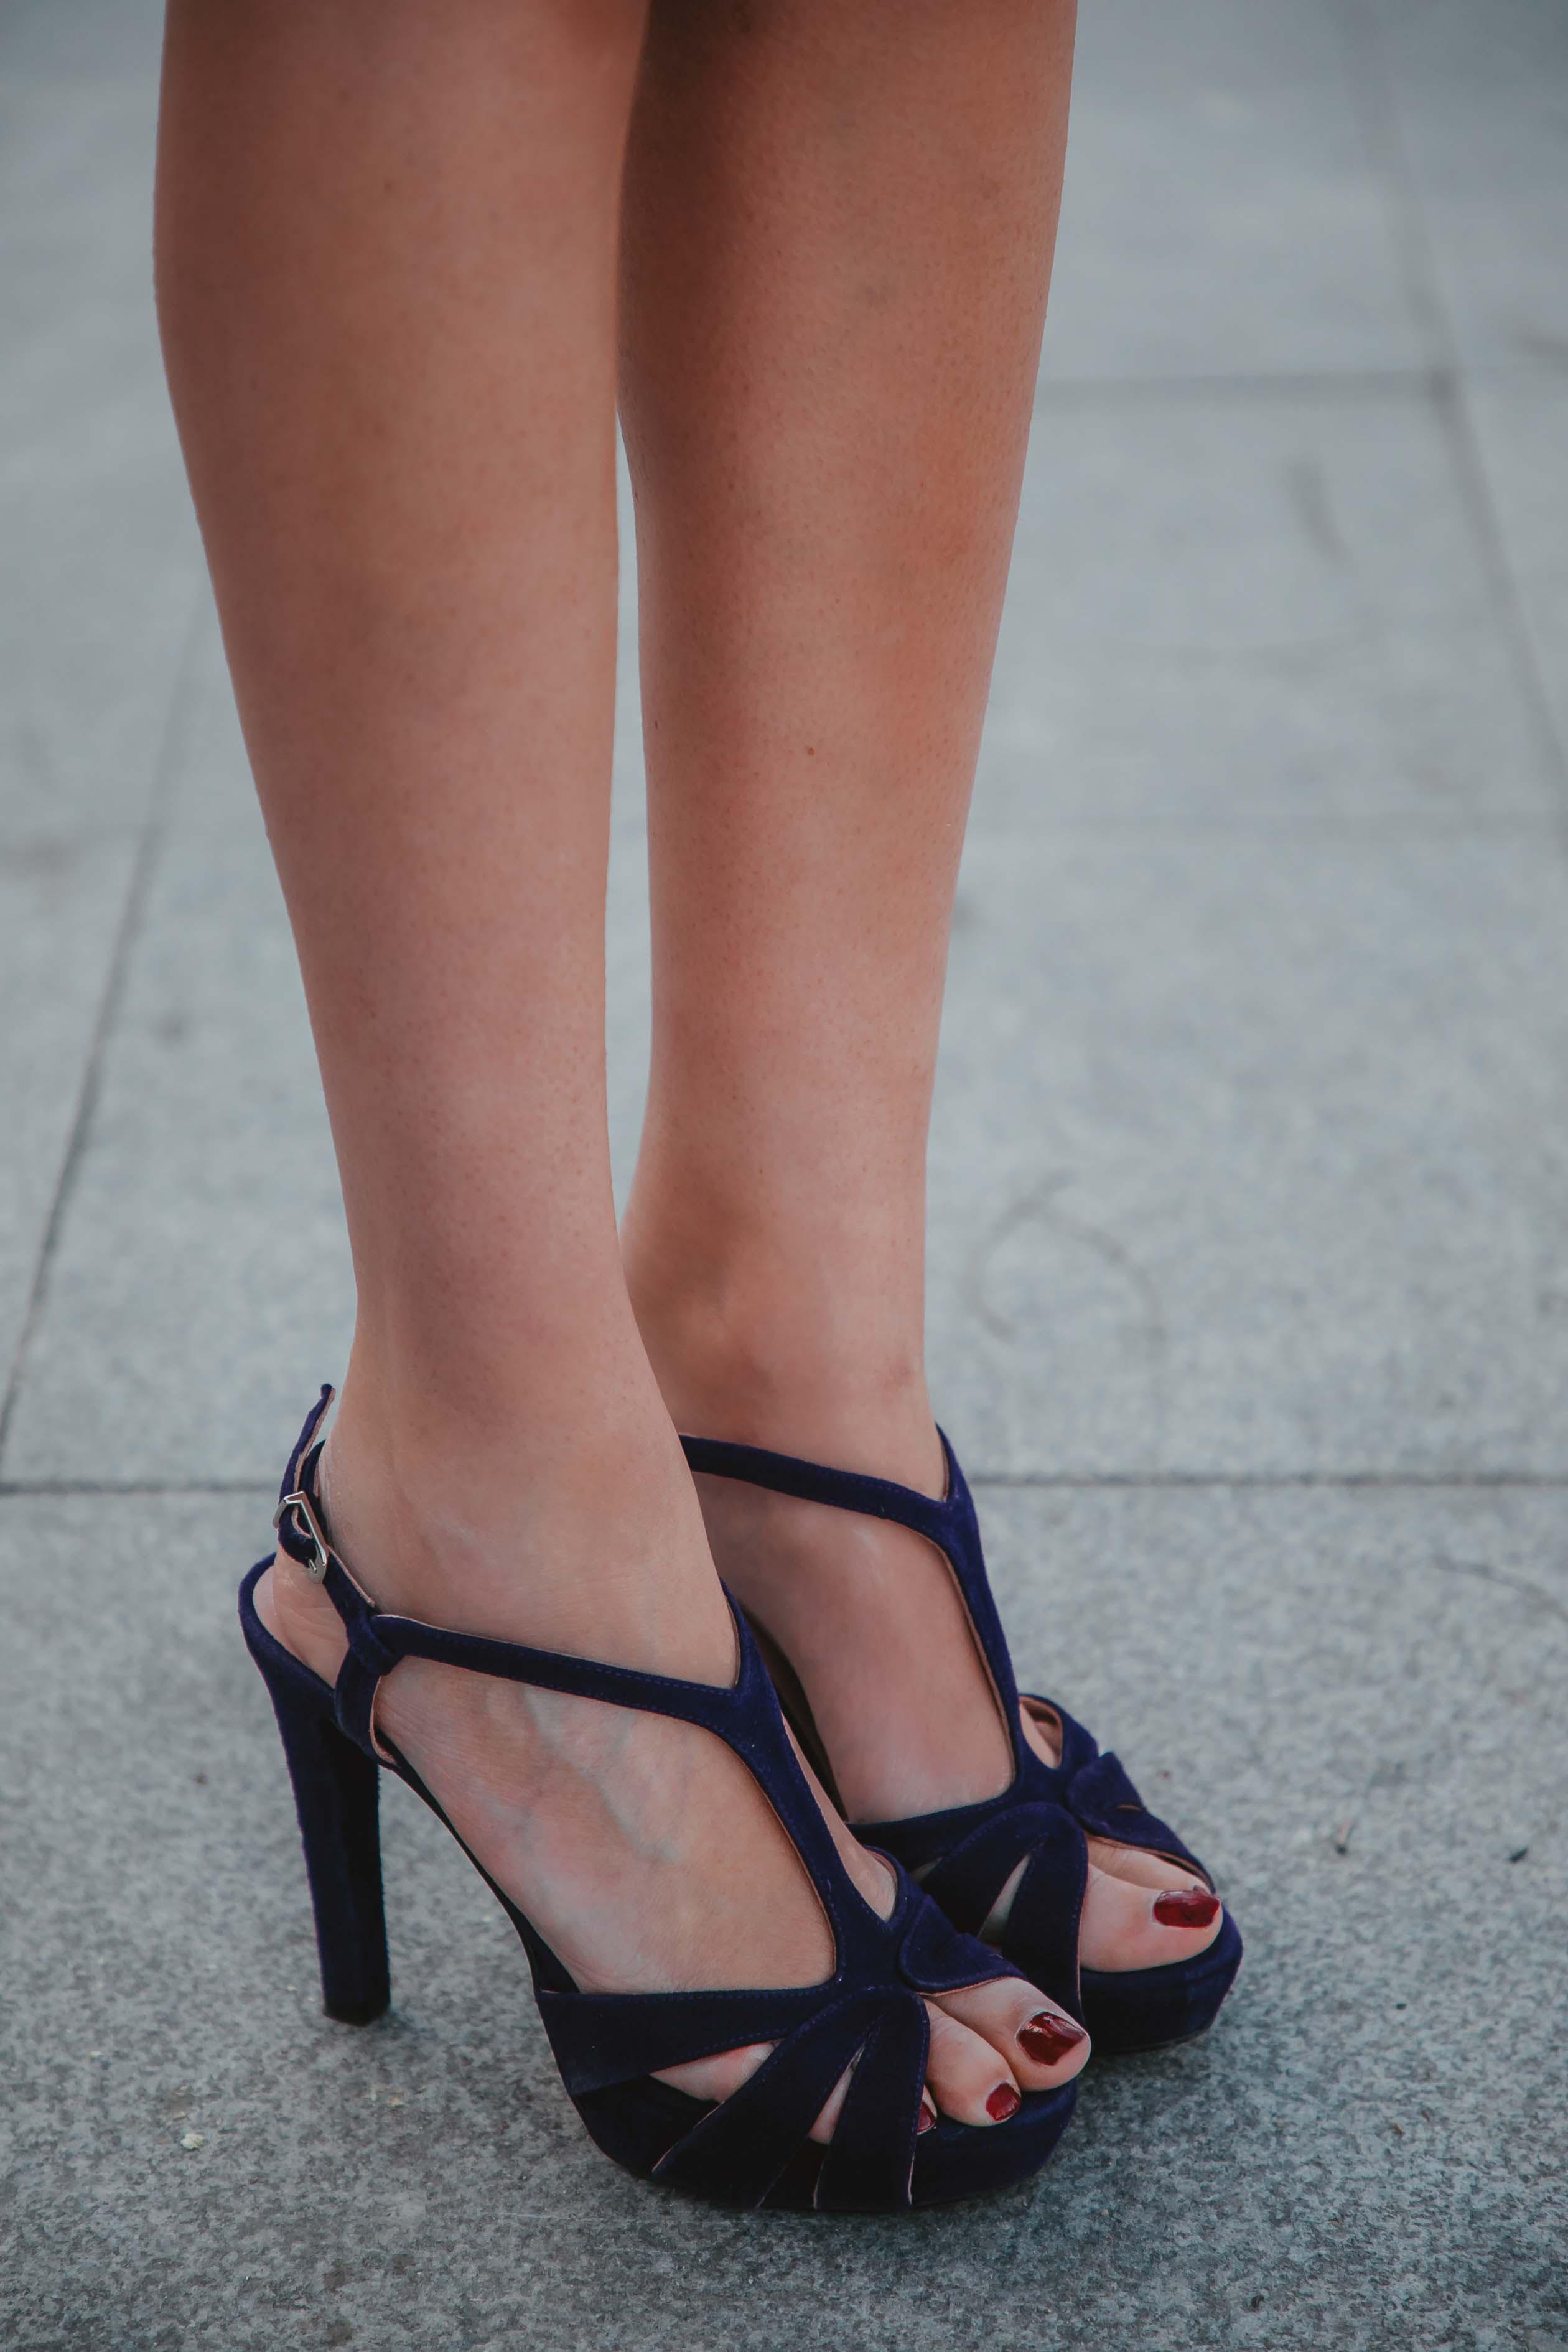 Zapatos morados invitada nuria cobo